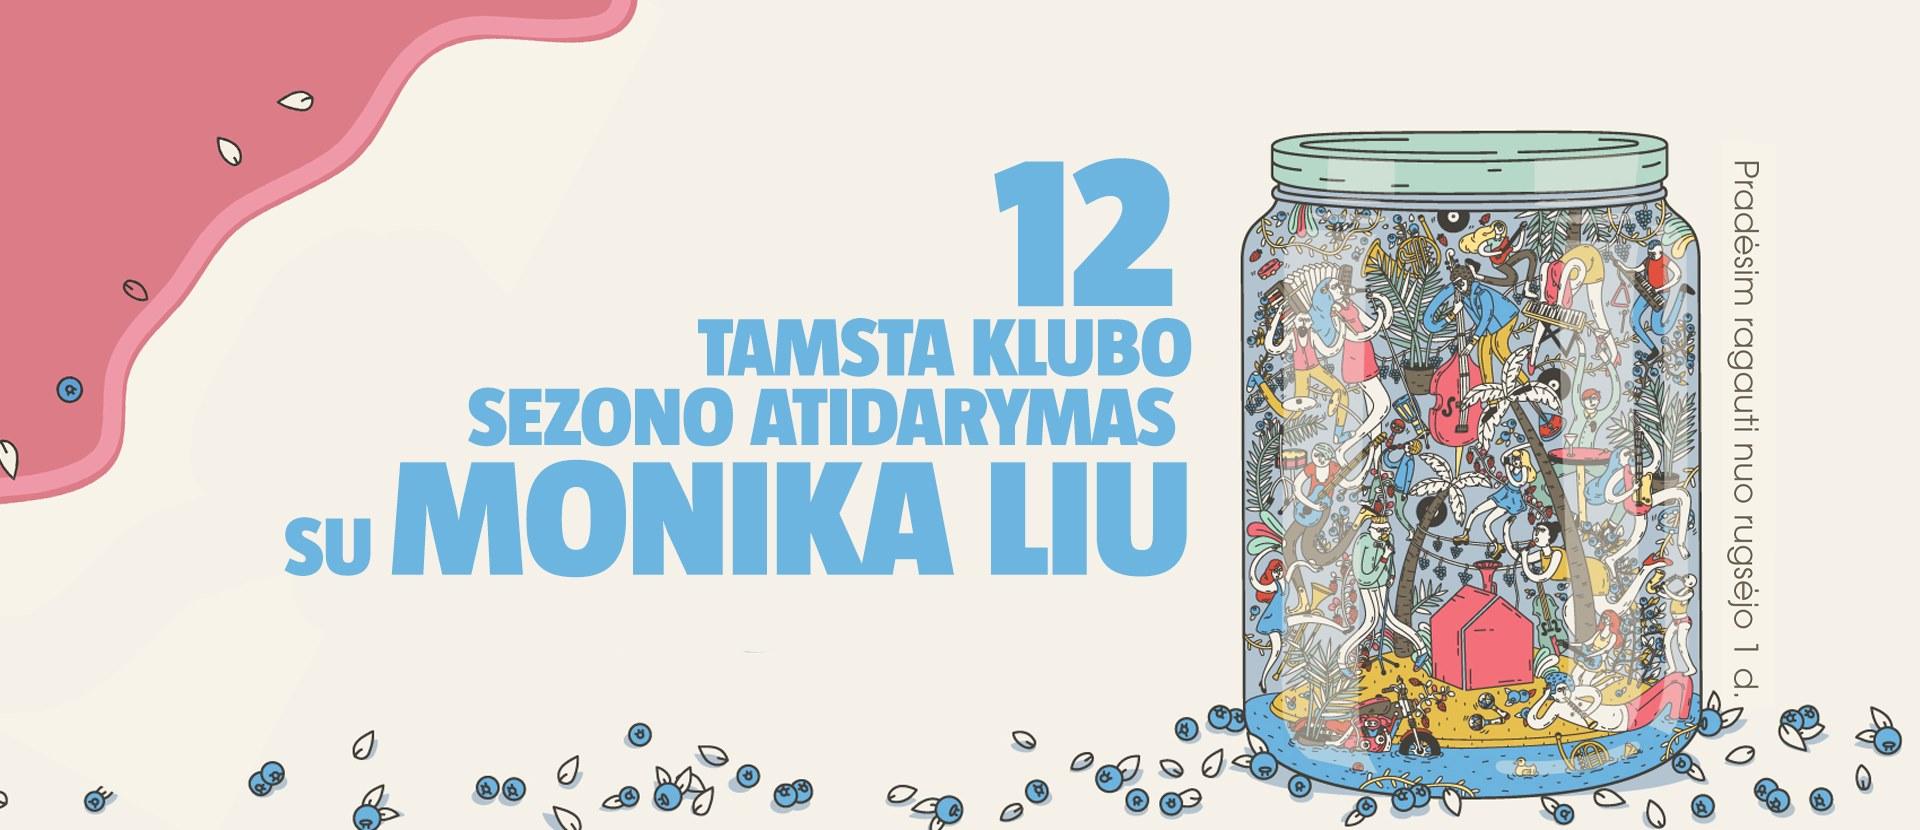 12 TAMSTA KLUBO ATIDARYMAS SU MONIKA LIU